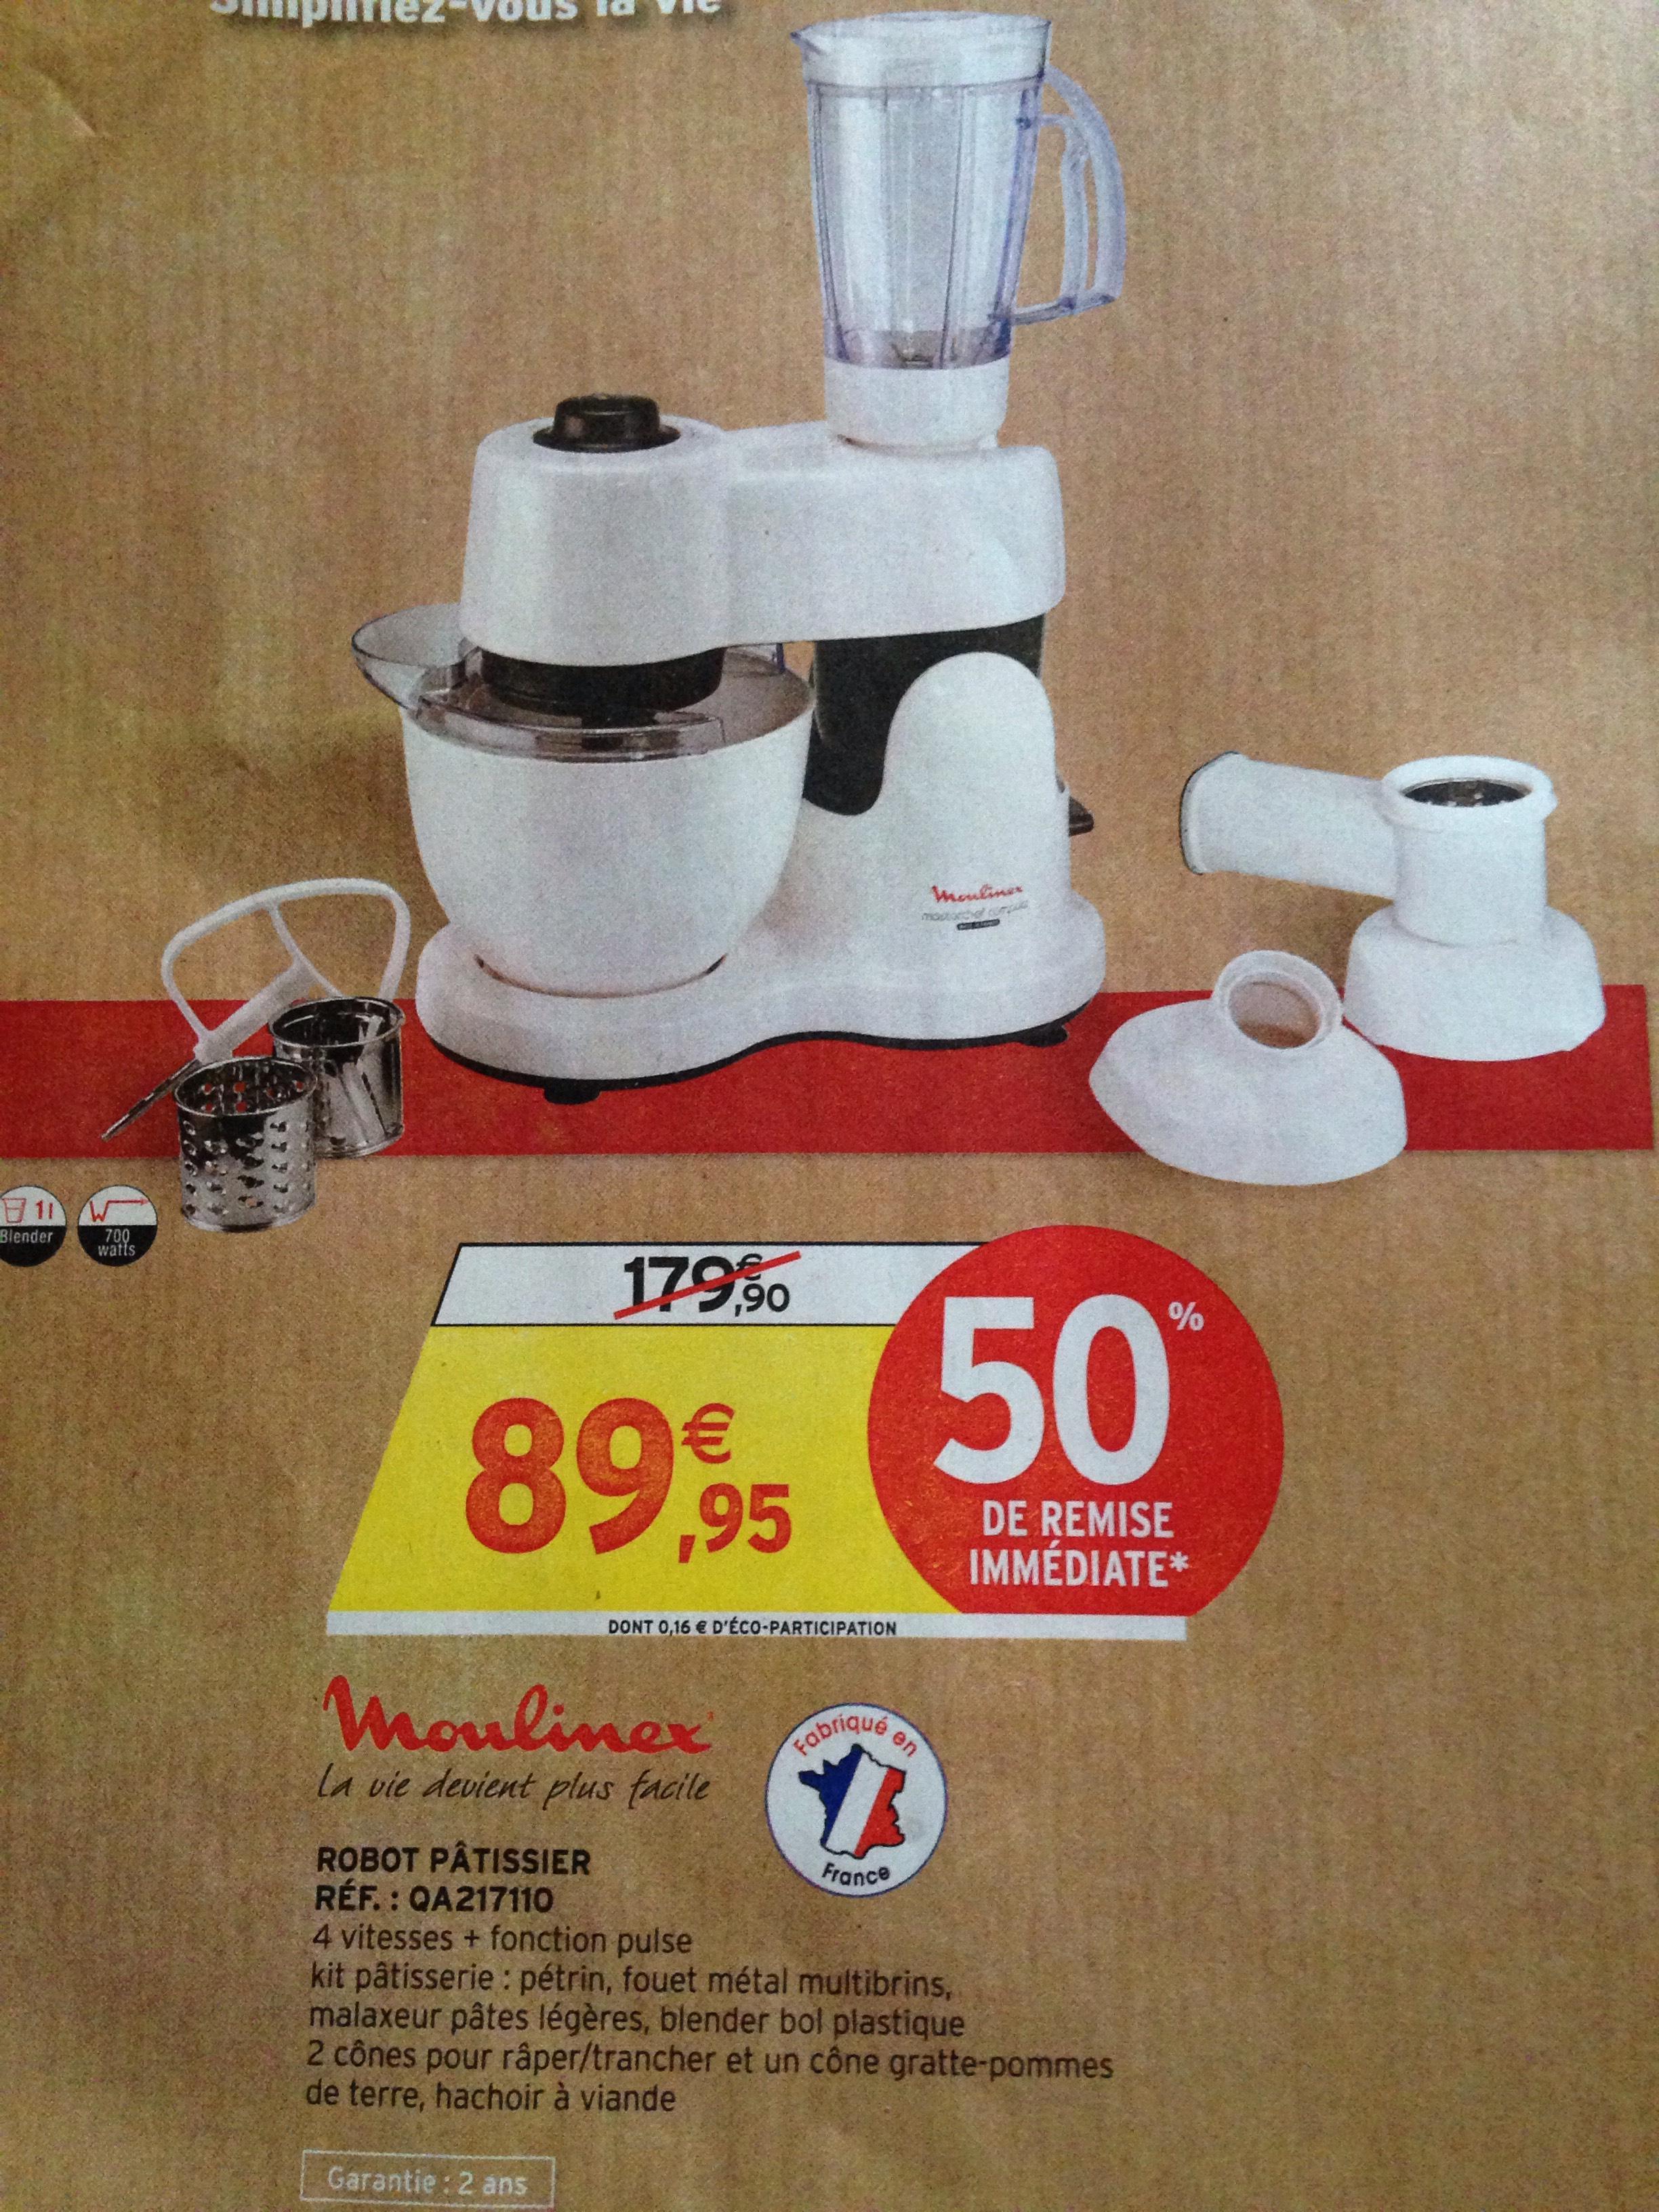 Robot pâtissier Moulinex QA217110